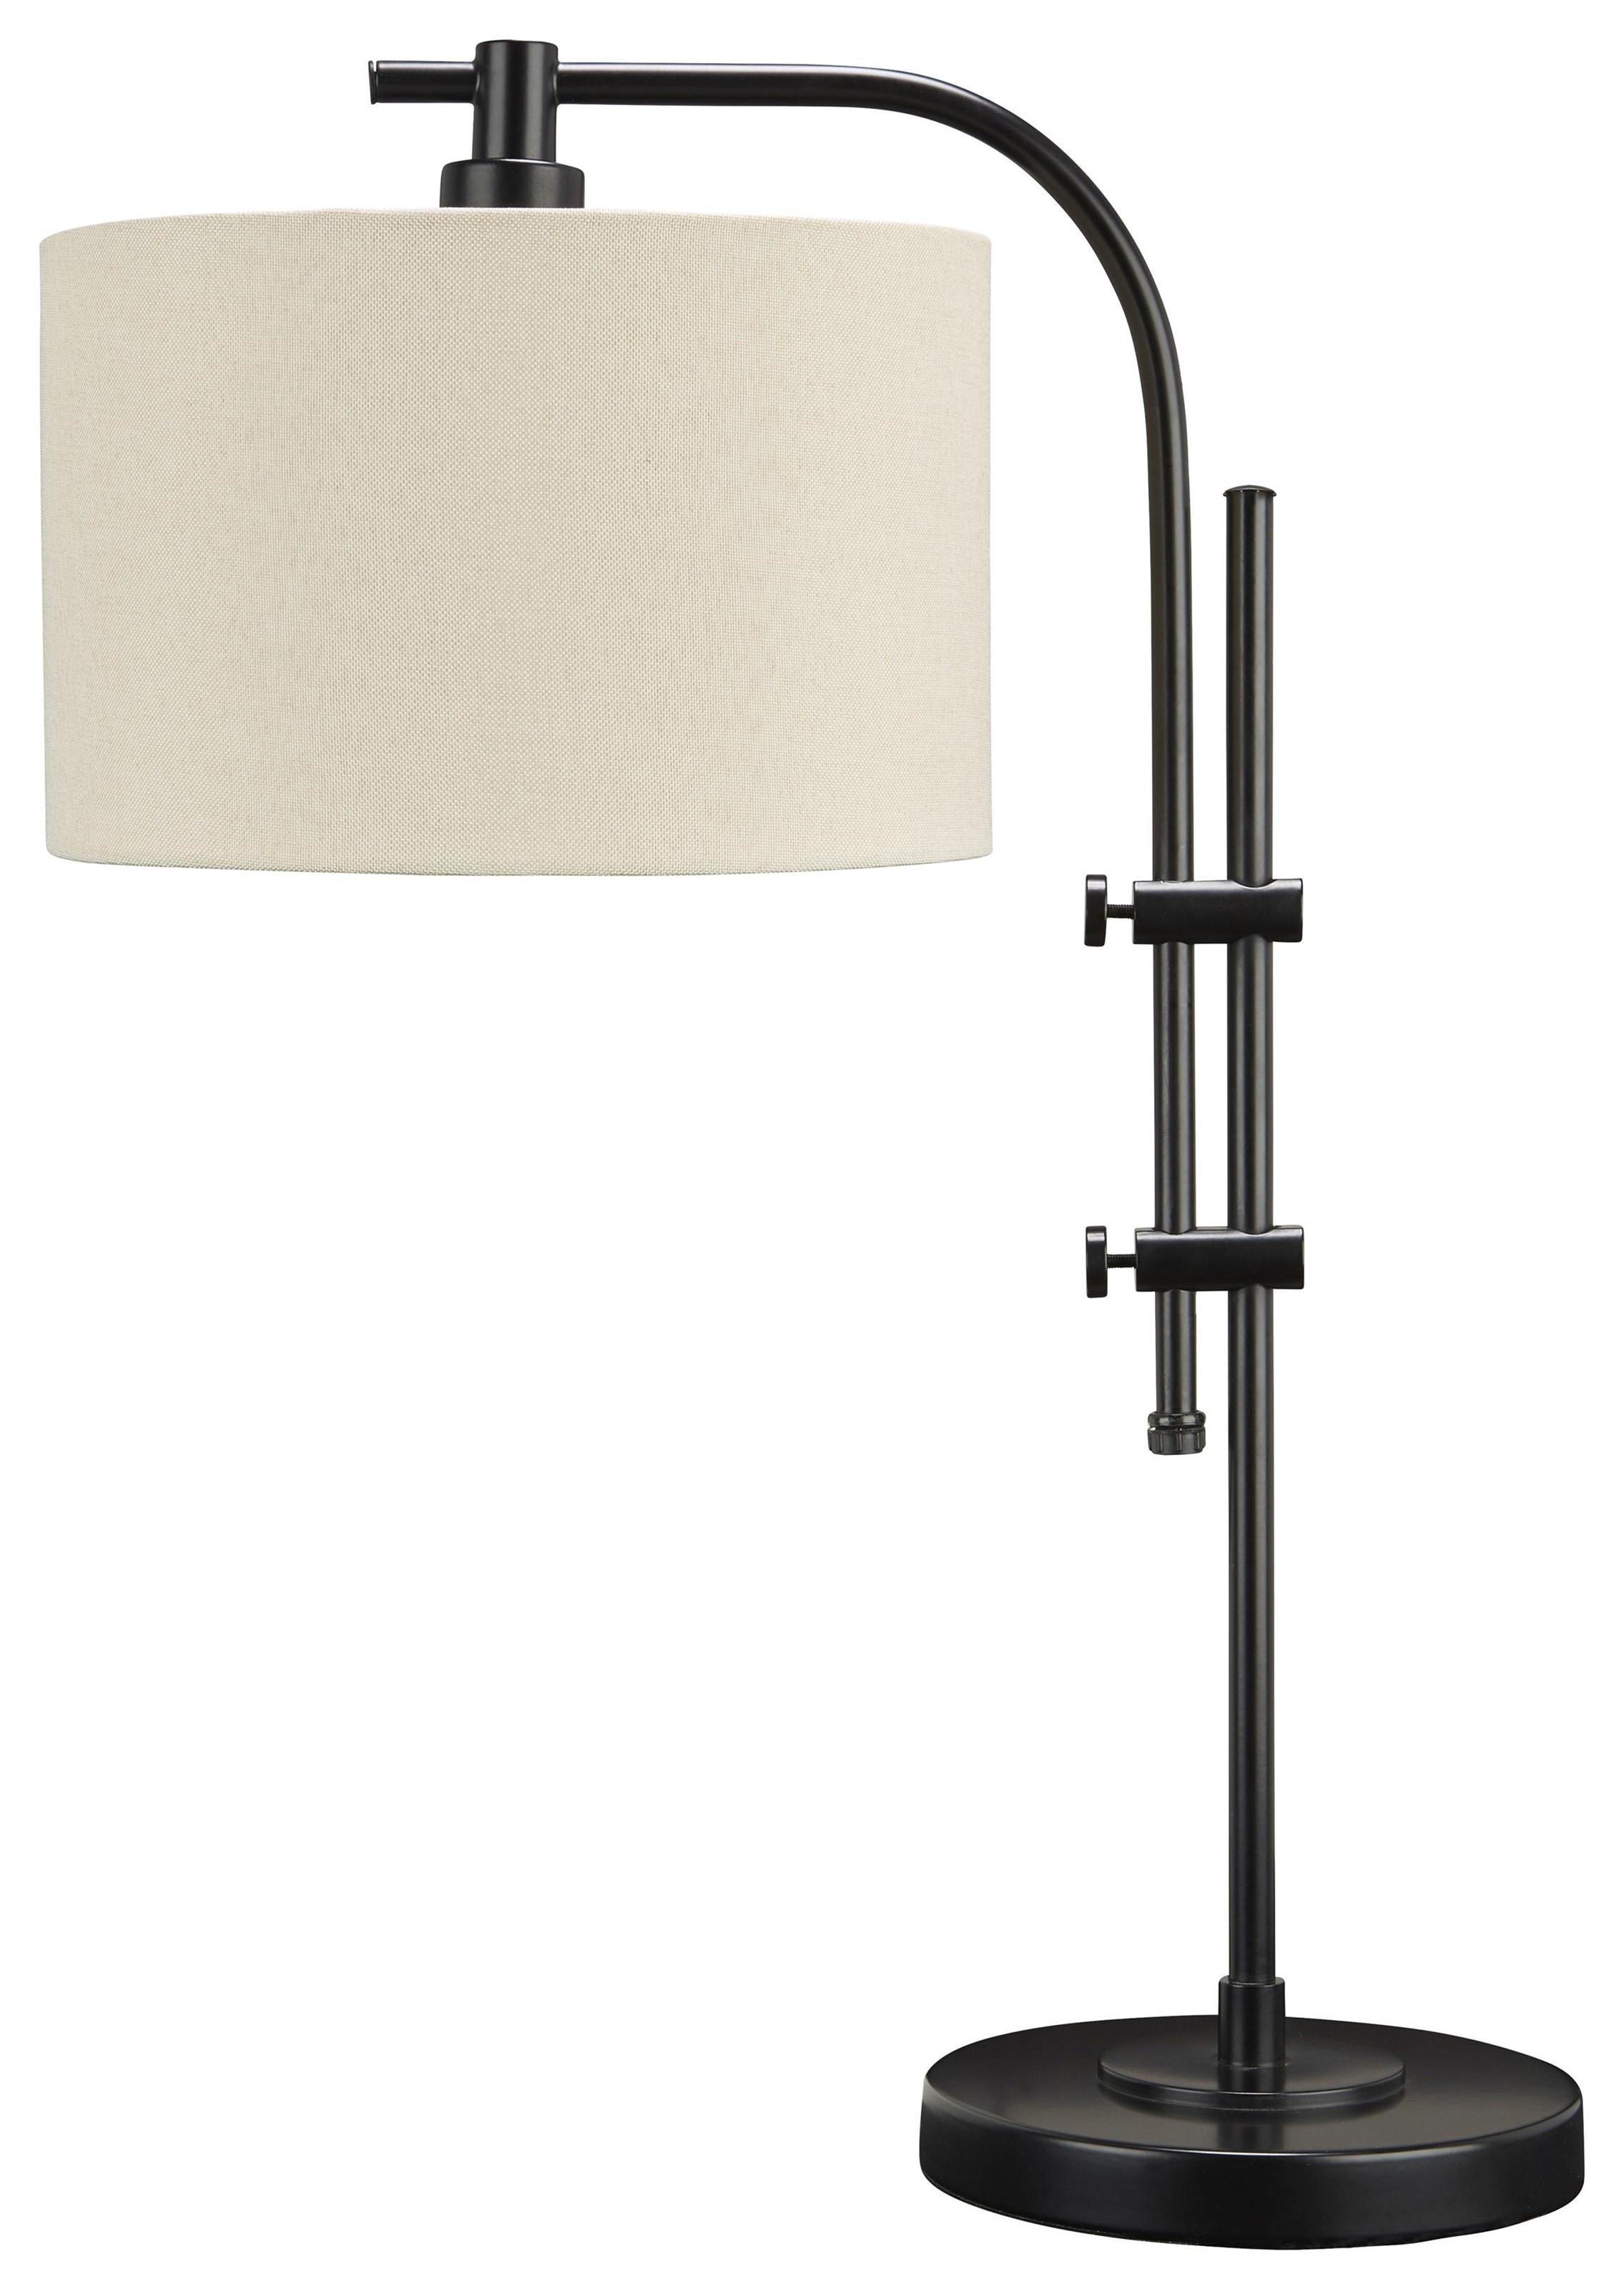 Baronvale Desk Lamp by Signature Design by Ashley at Sam Levitz Furniture